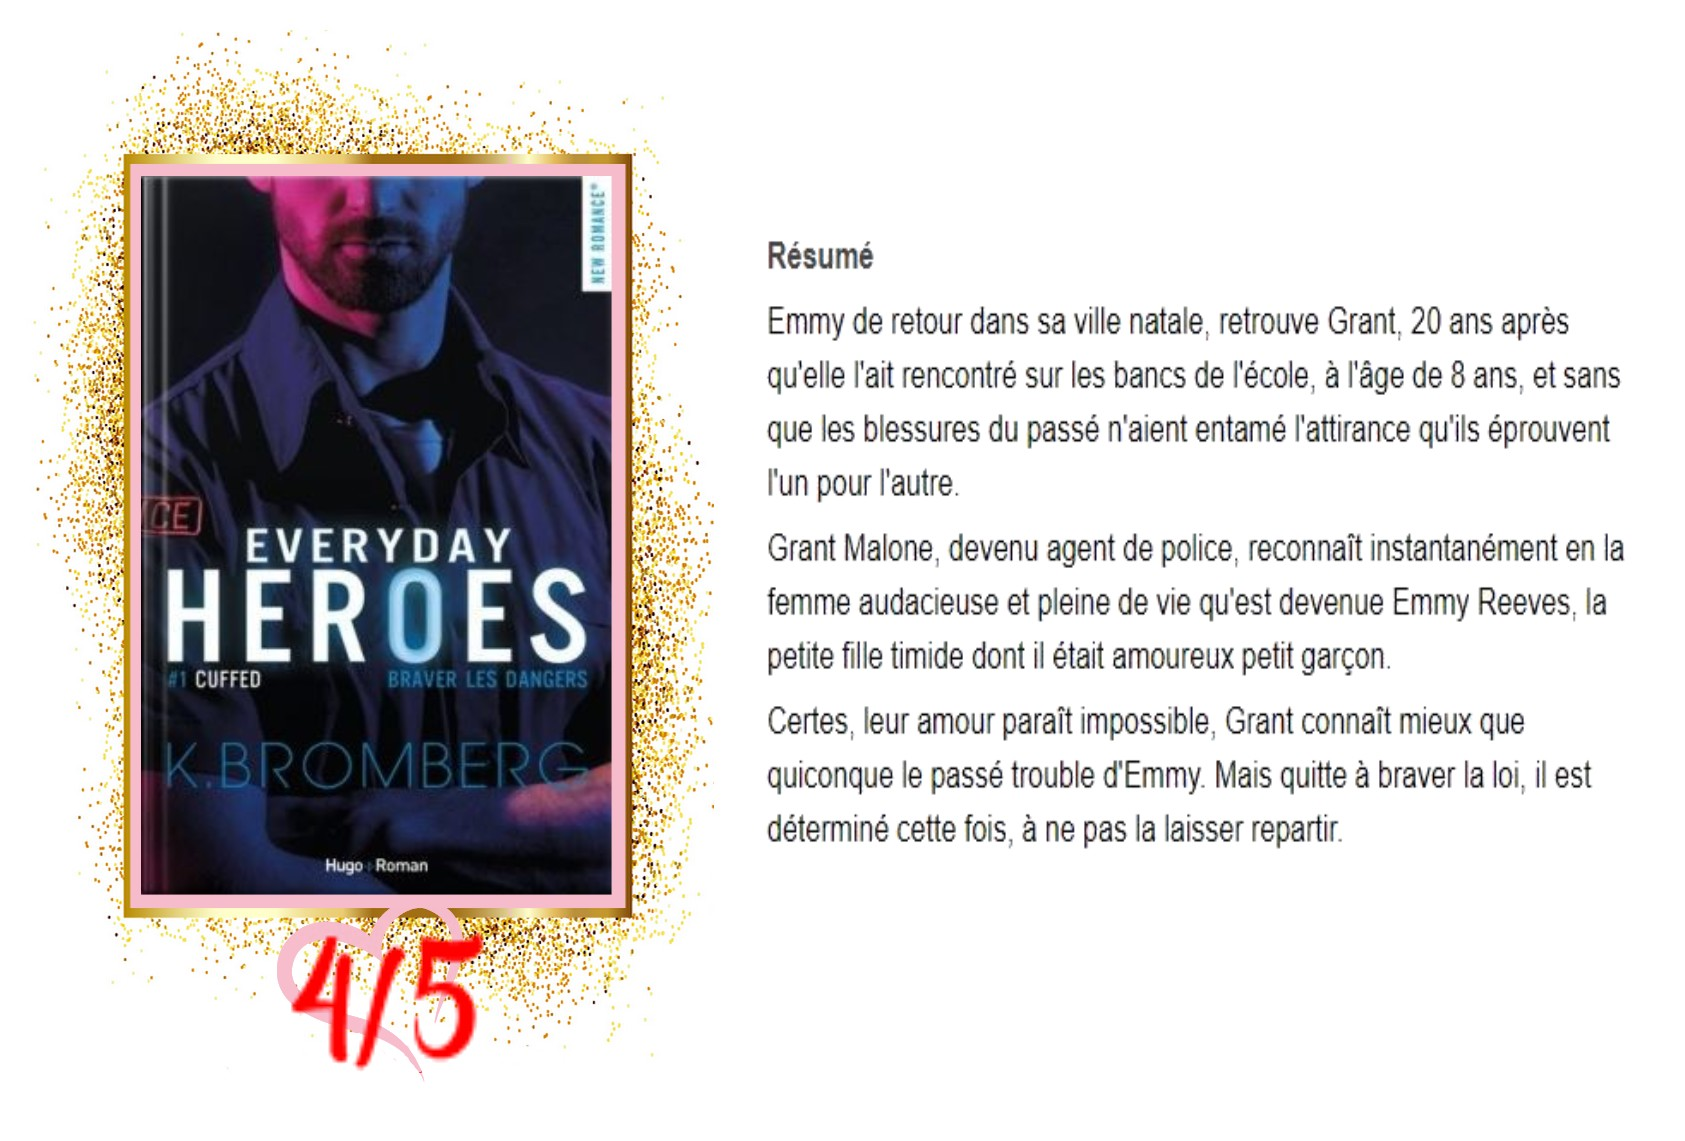 Everyday Heroes, tome 1 Cuffed avis